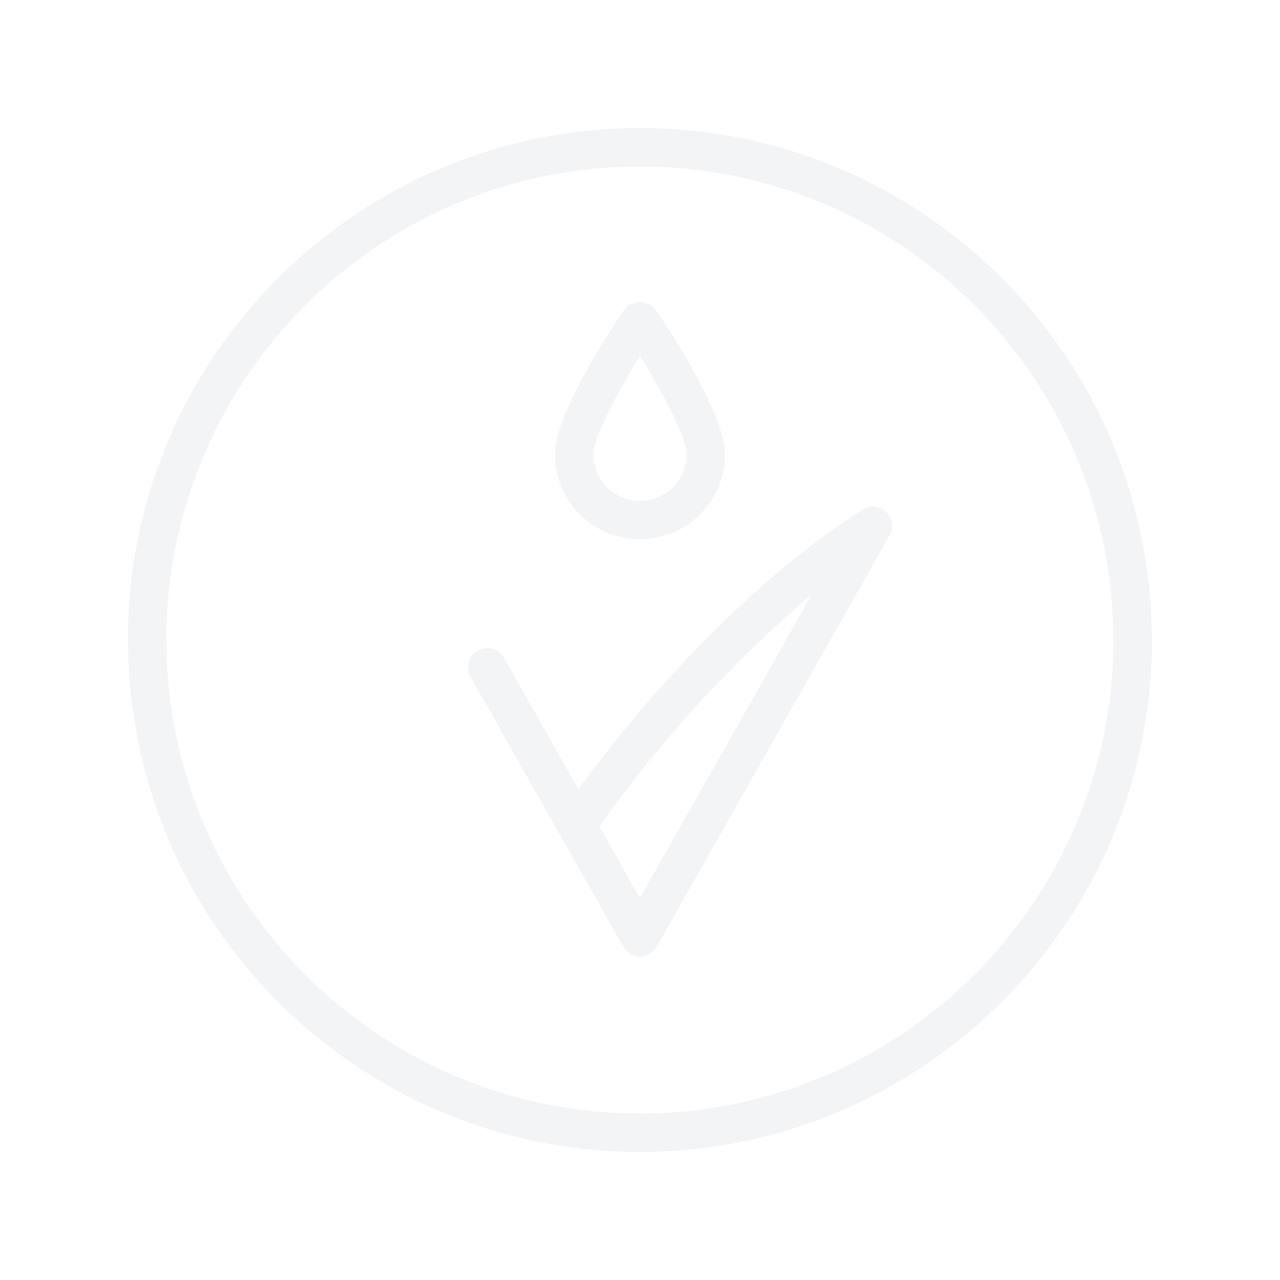 CLARINS Everlasting Cushion Foundation SPF50 13ml